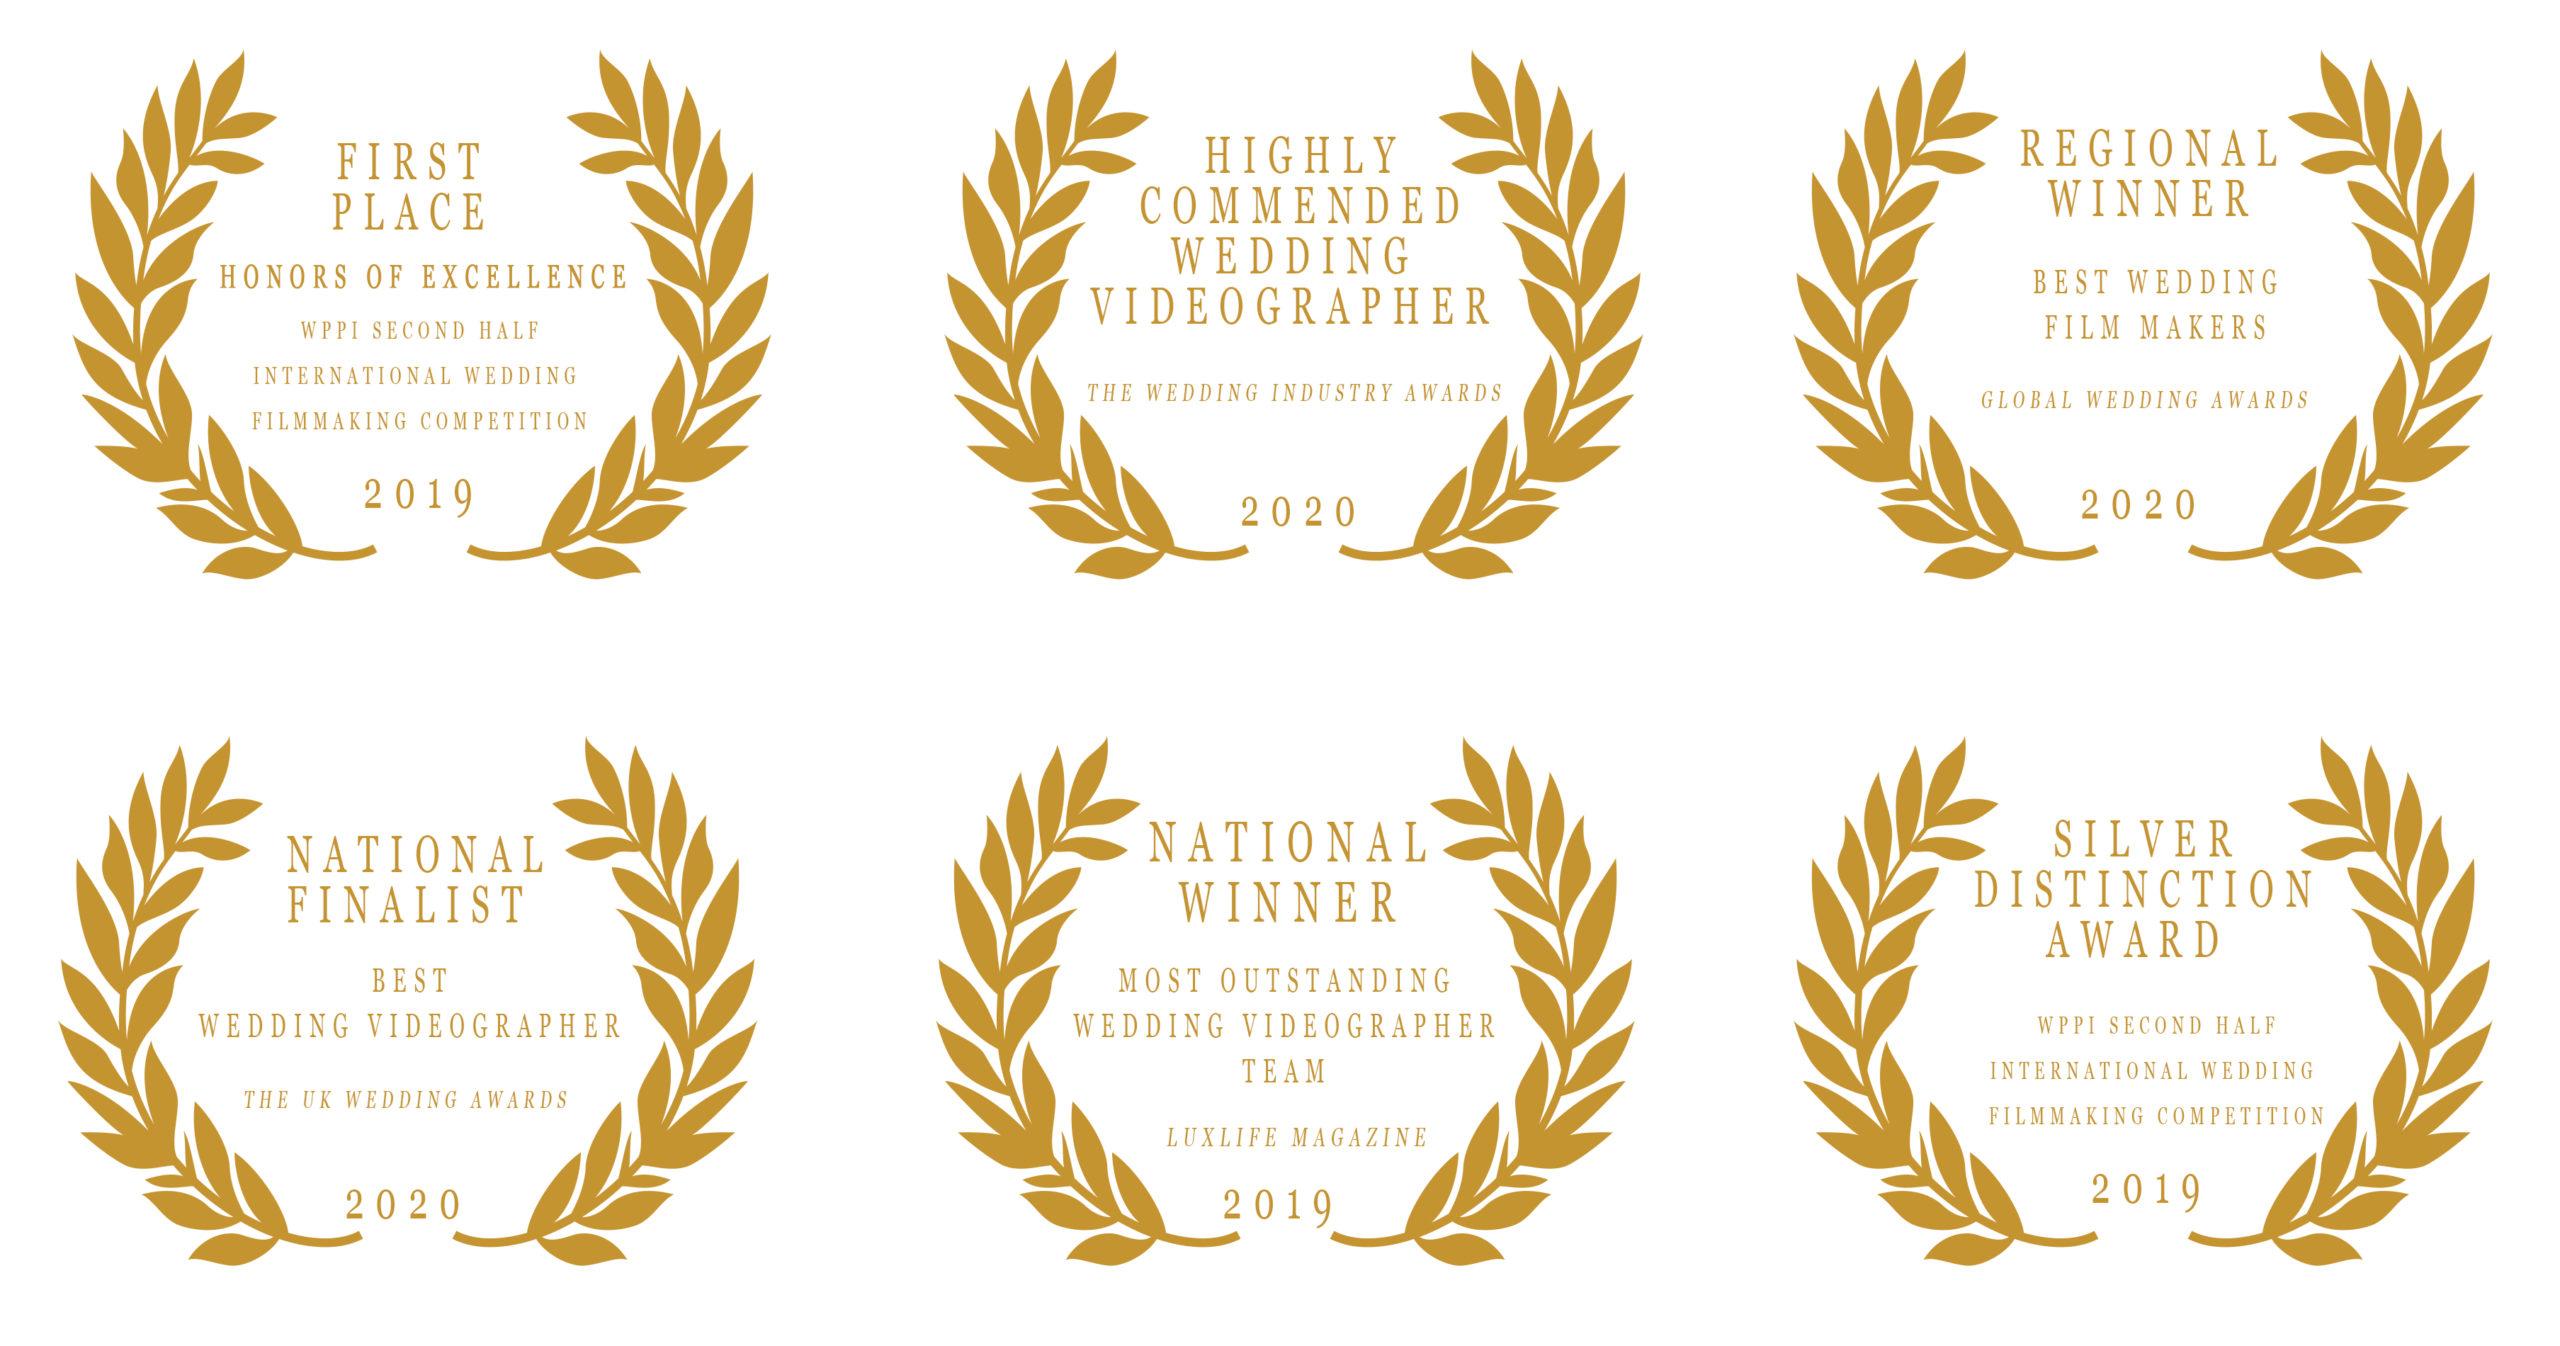 Award winning wedding films